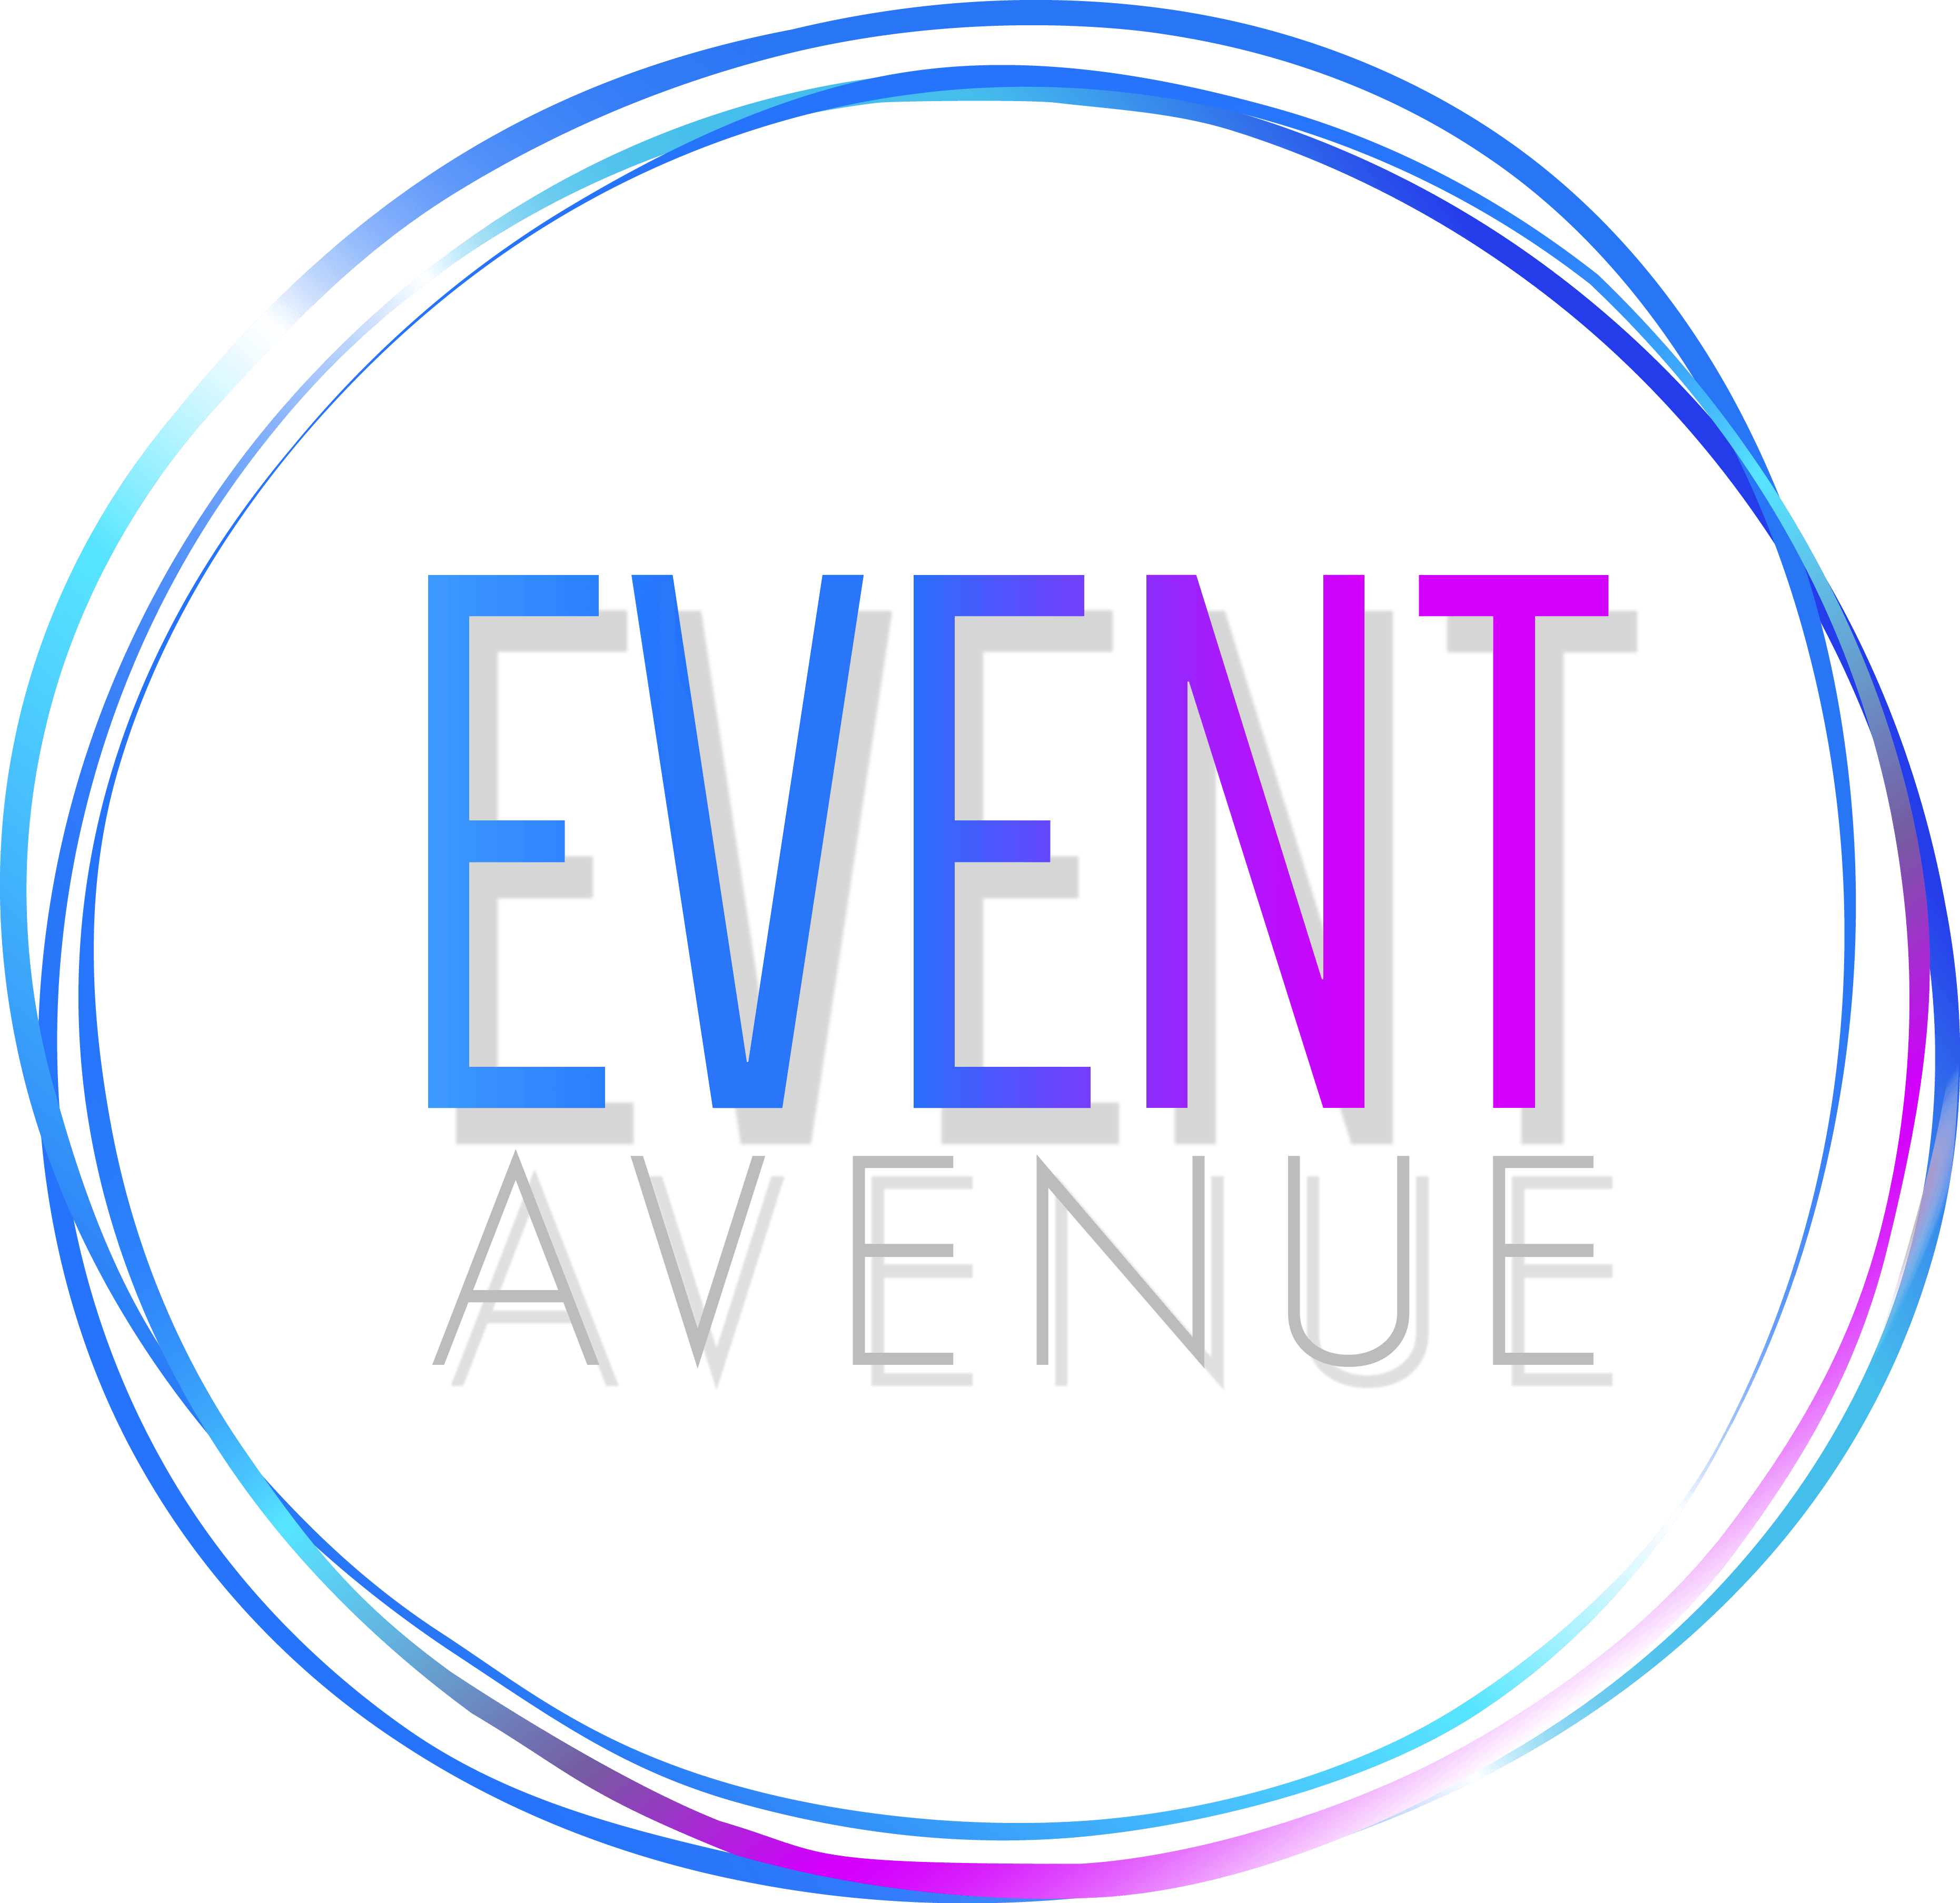 Event Avenue